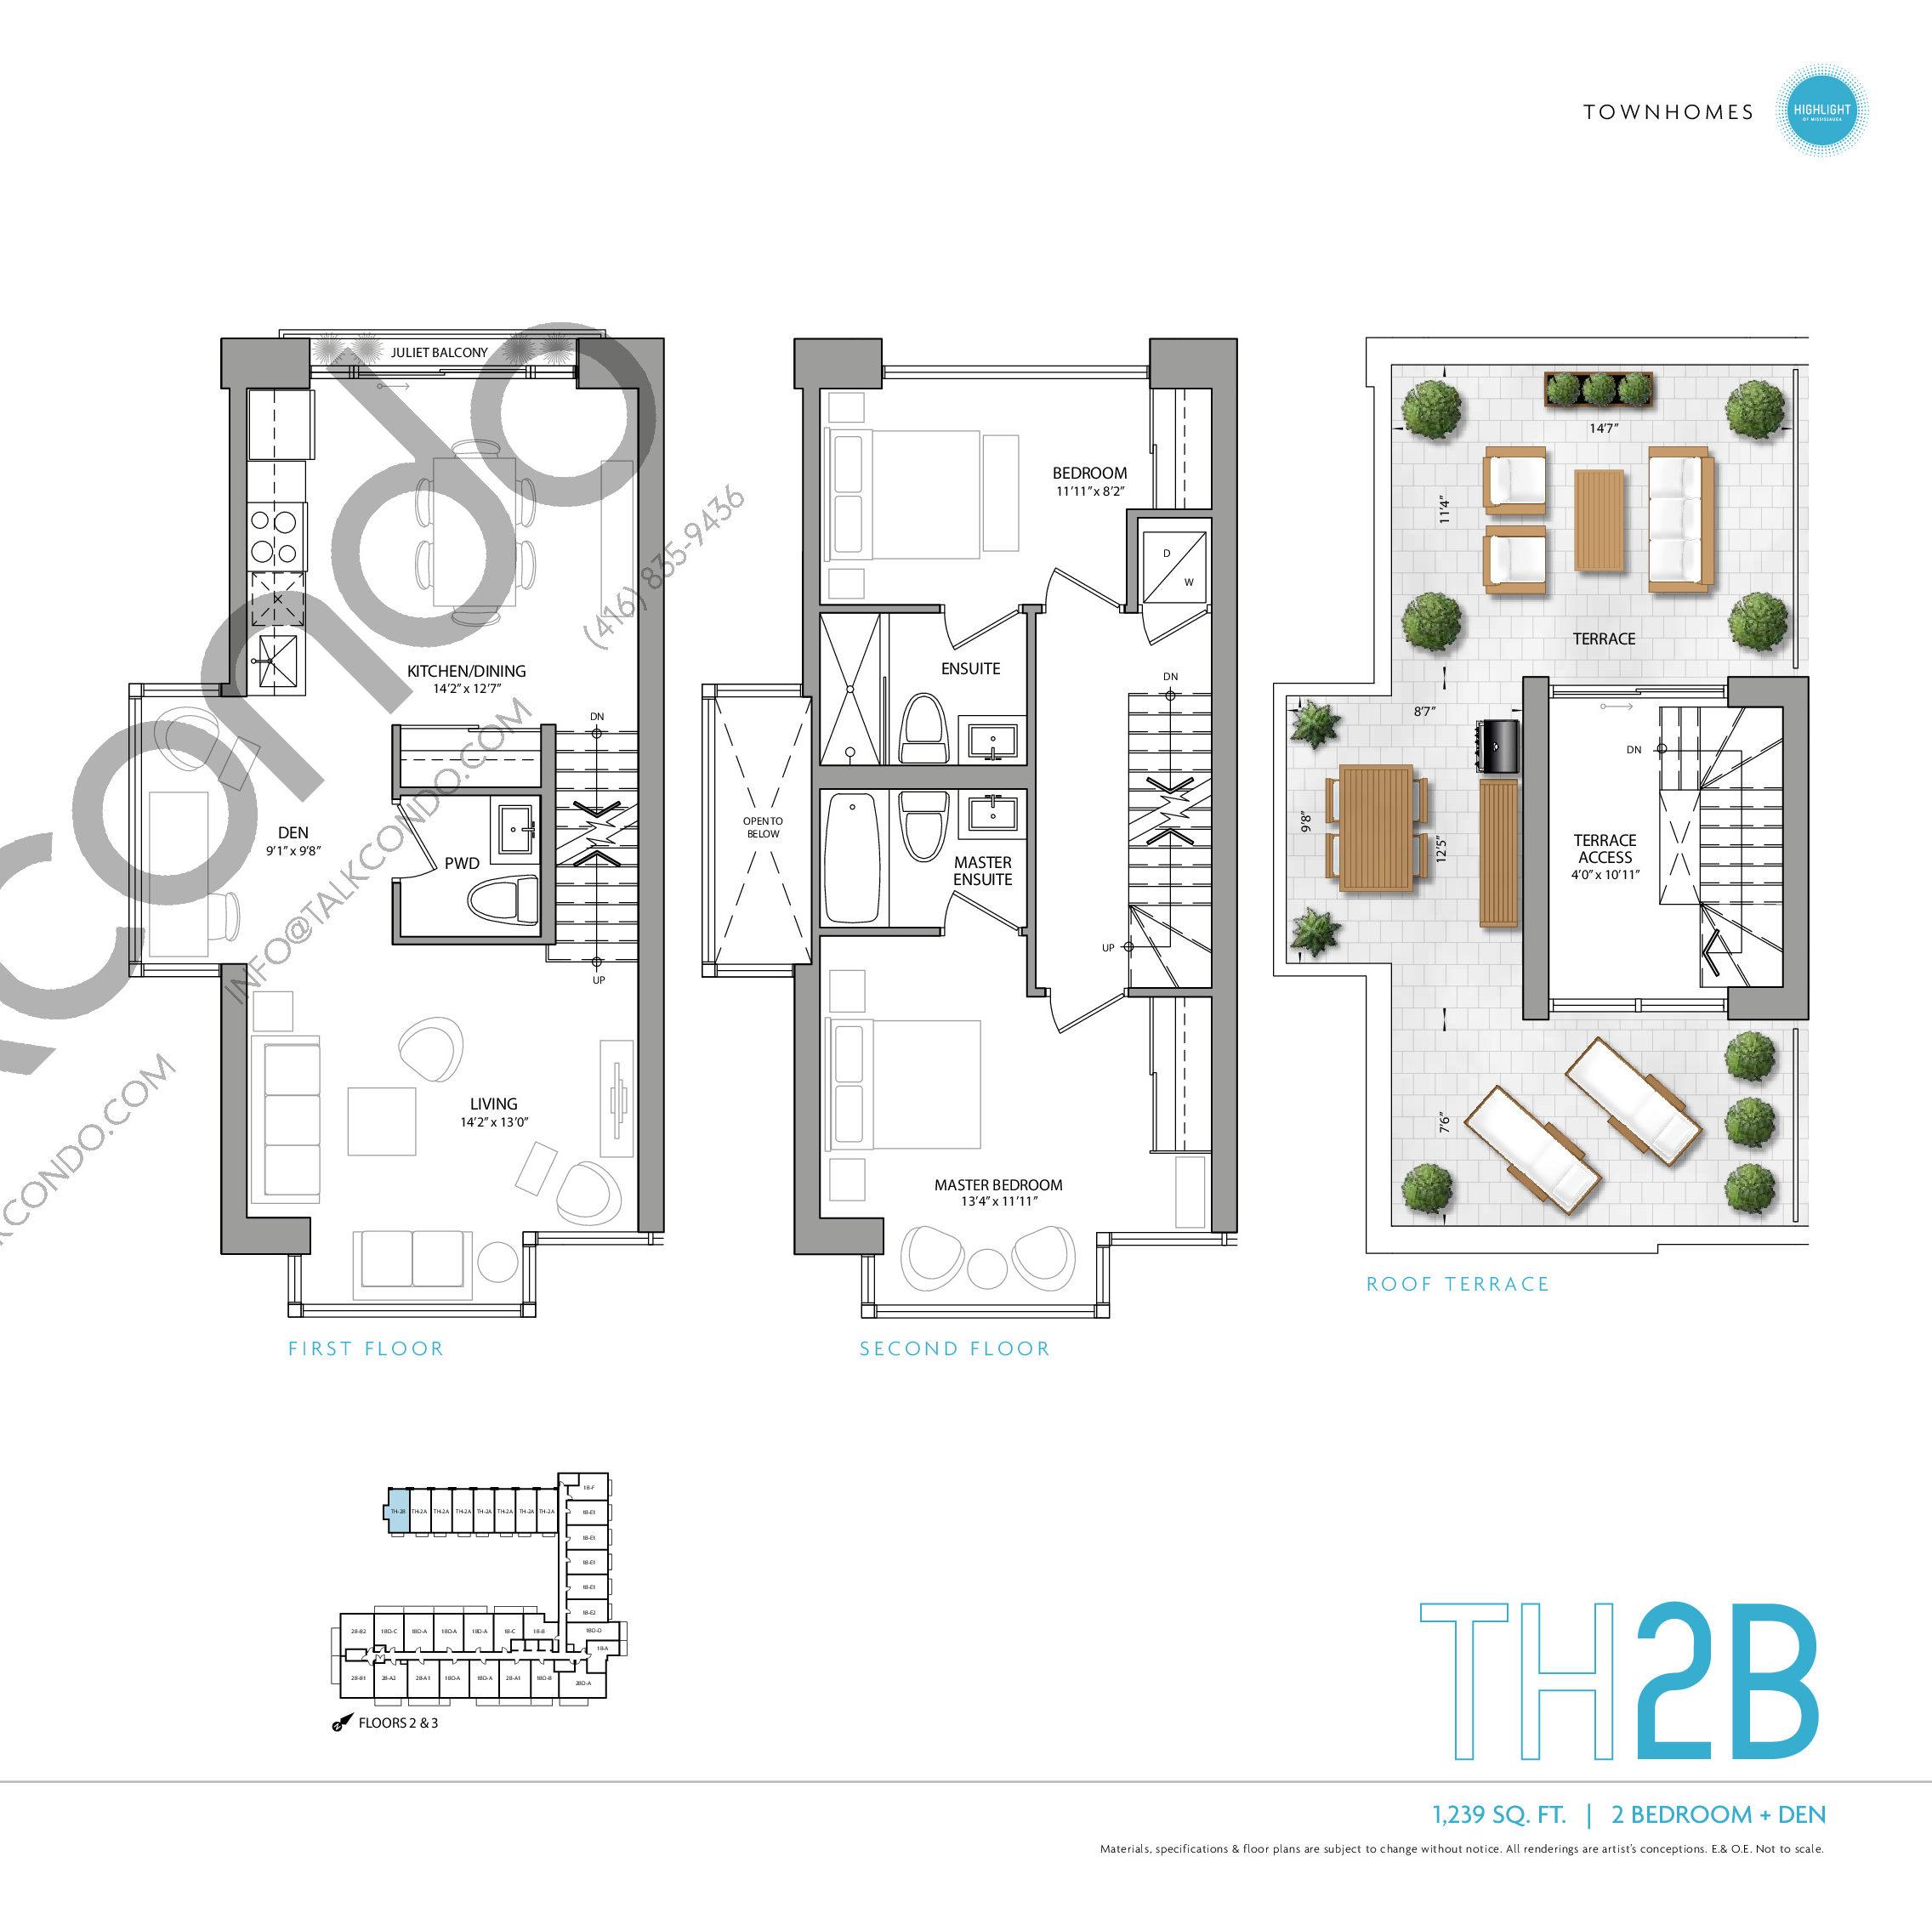 TH2B Floor Plan at Highlight Condos and Towns - 1239 sq.ft